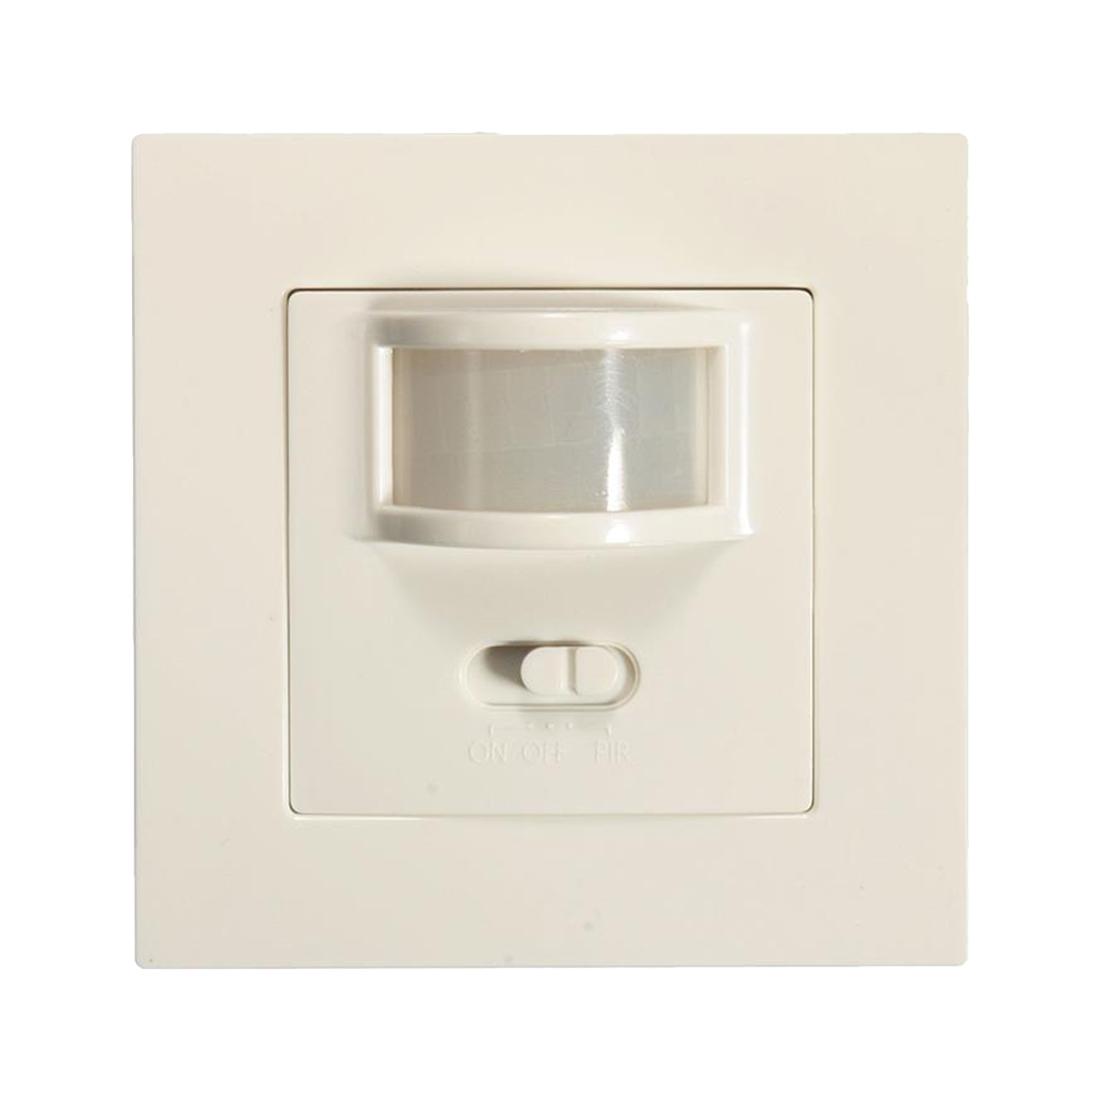 occupancy sensor pir motion light switch presence detection selection. Black Bedroom Furniture Sets. Home Design Ideas